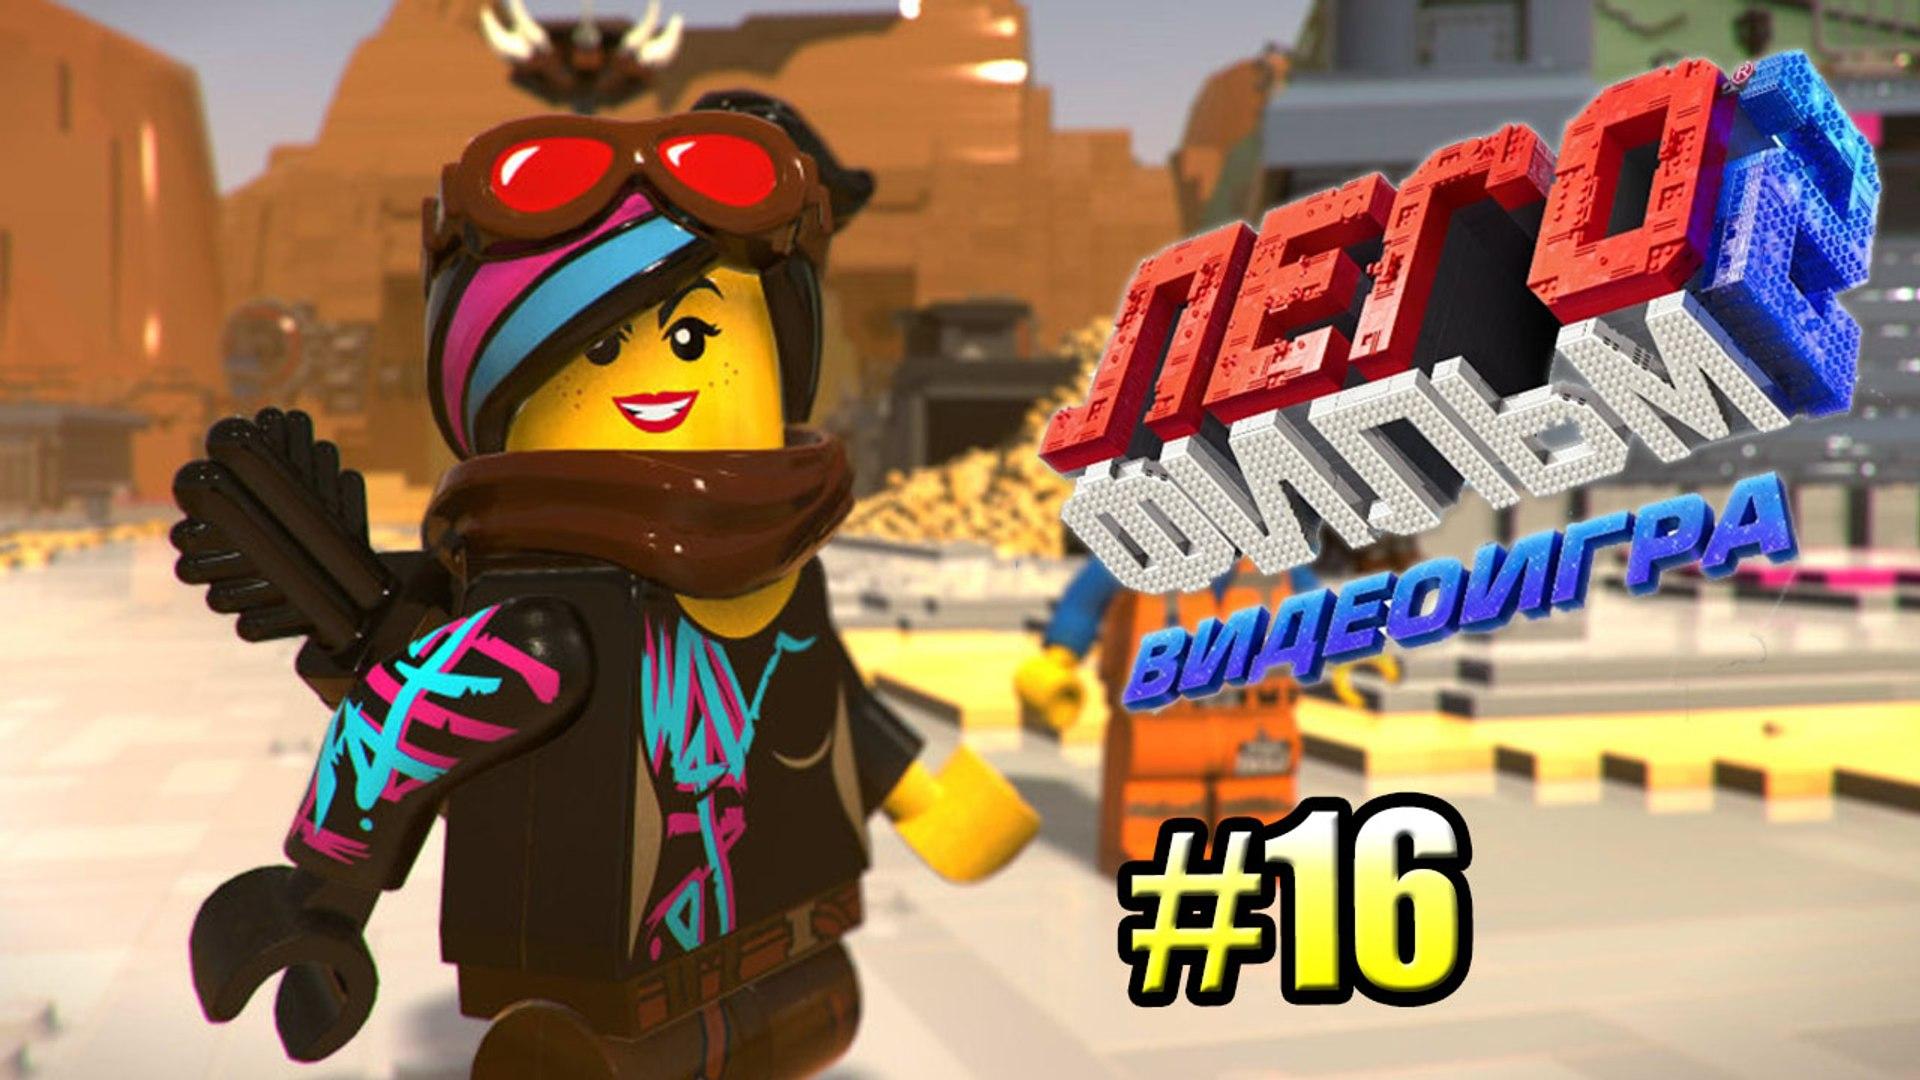 The LEGO Movie 2 Videogame прохождение #16 на русском {PC} Гармония Град на 100%